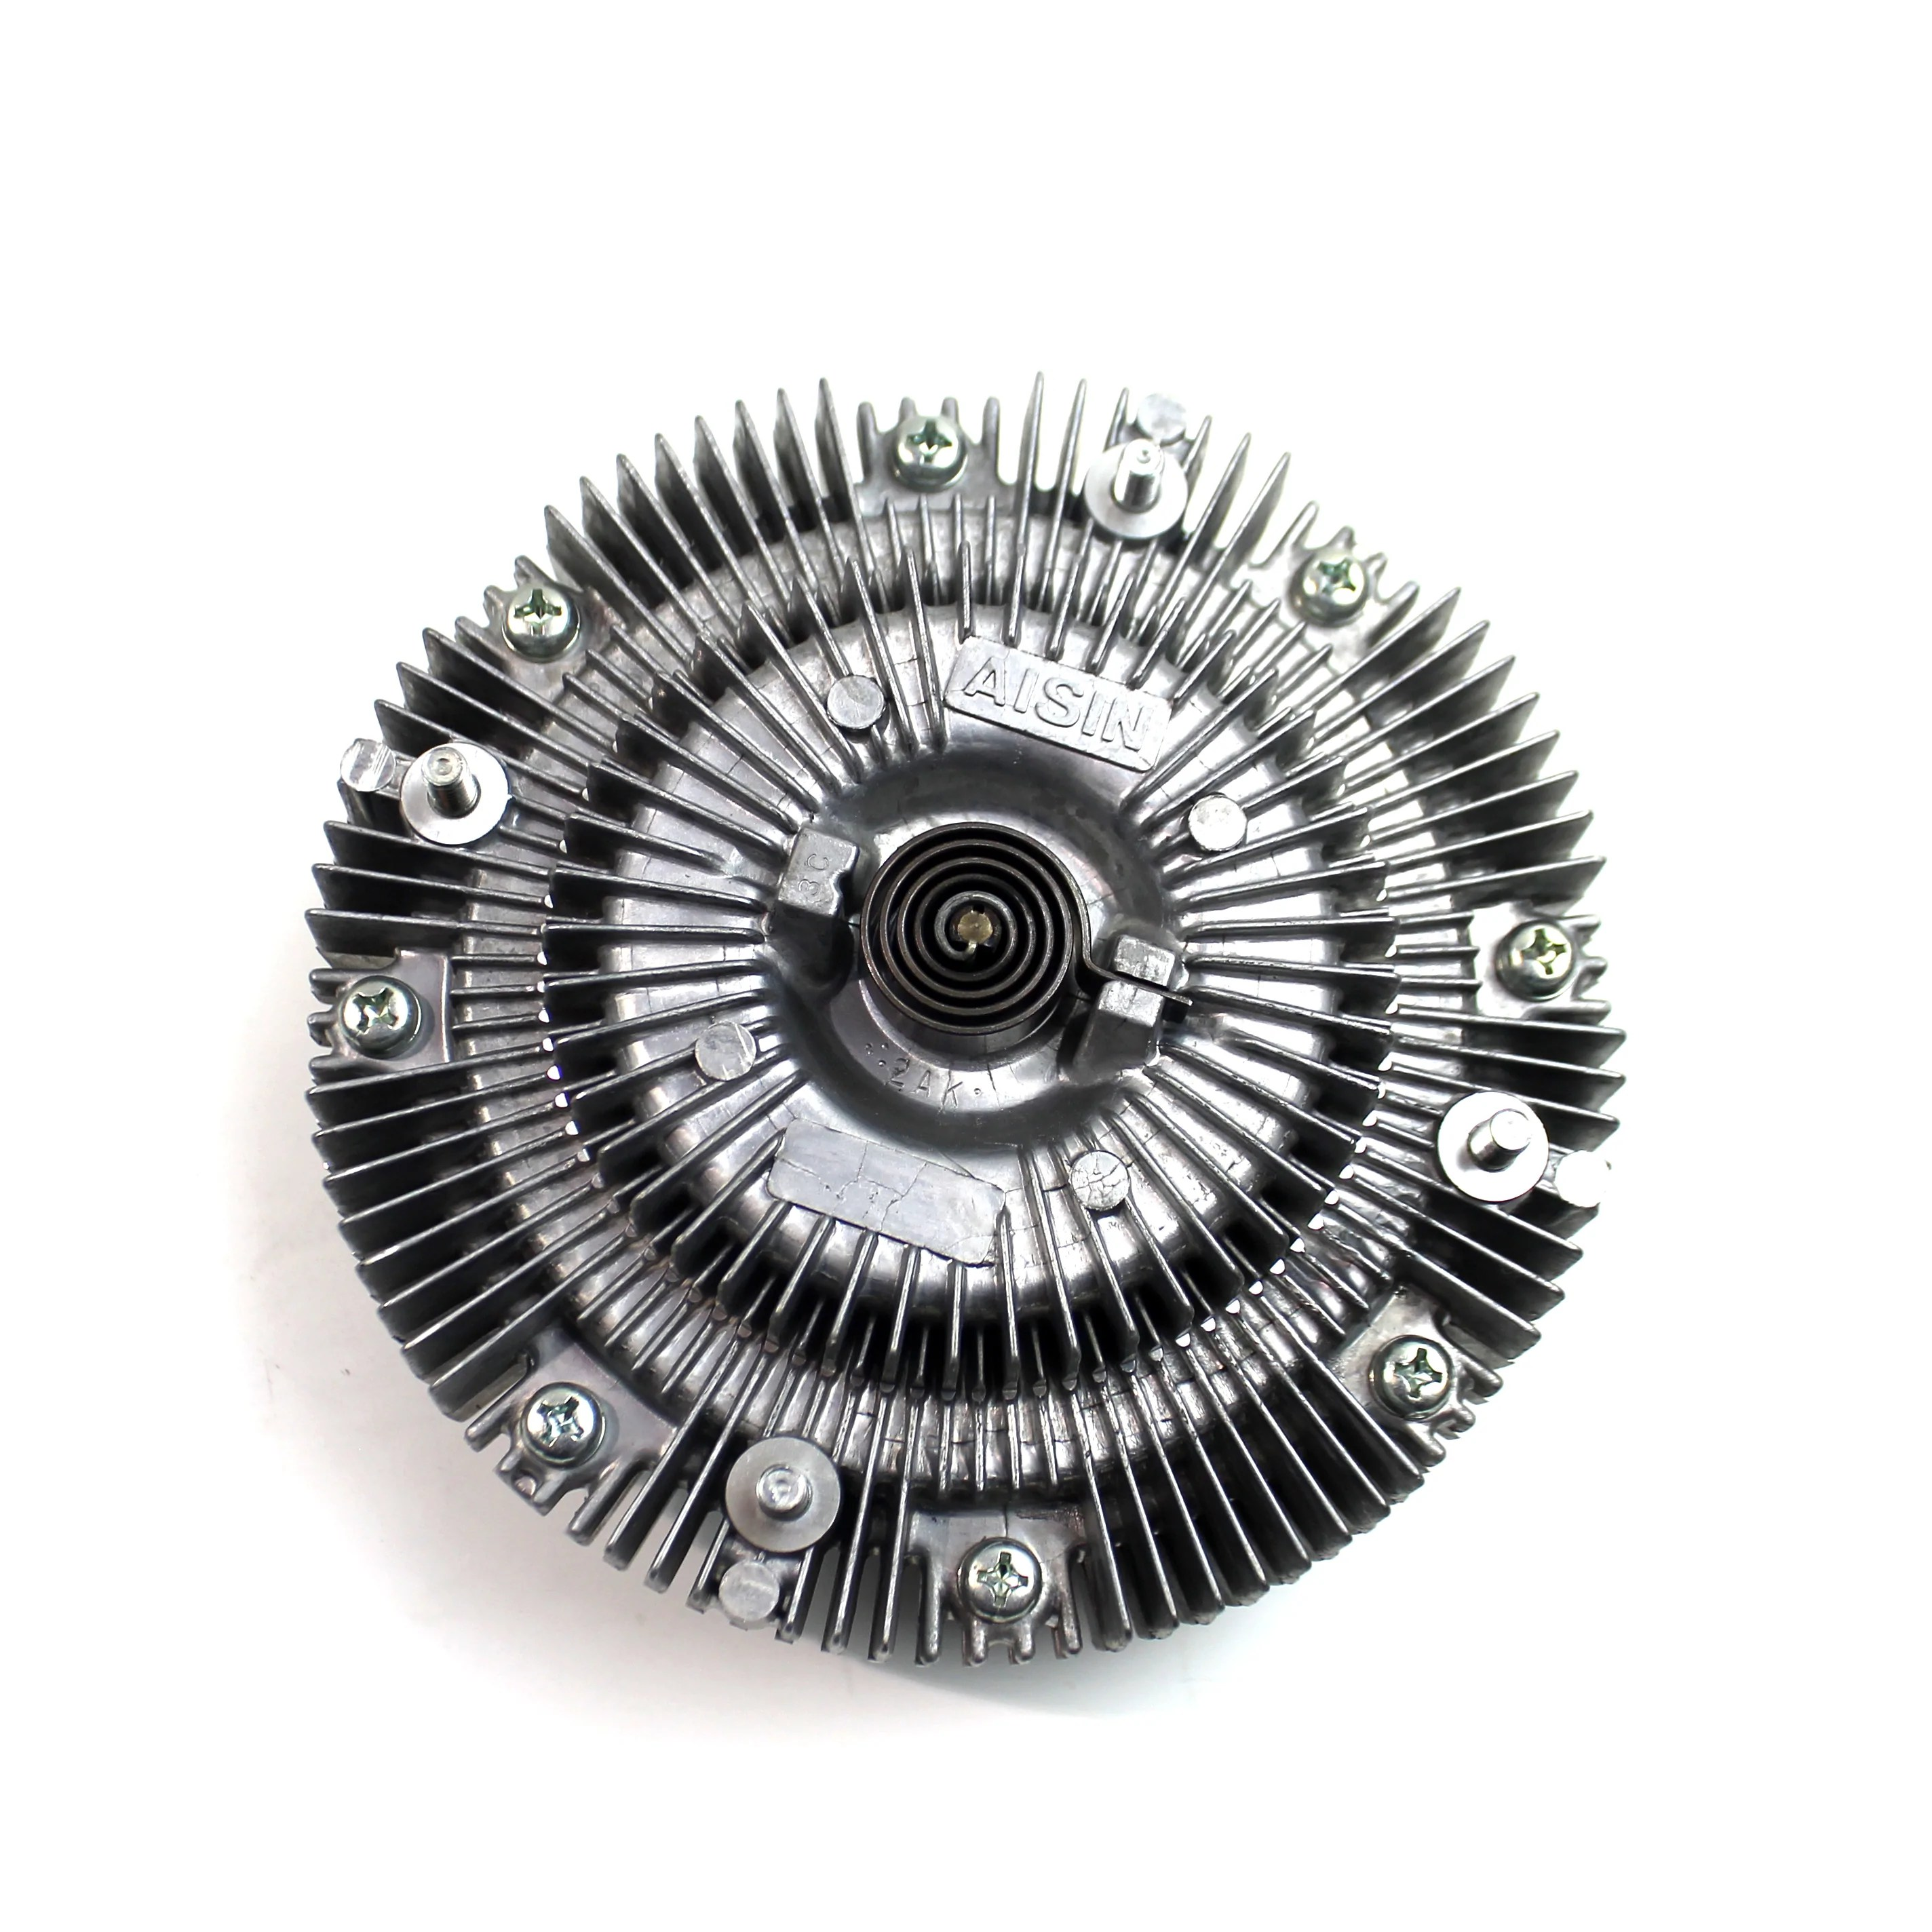 hight resolution of aisin cooling fan clutch fj80